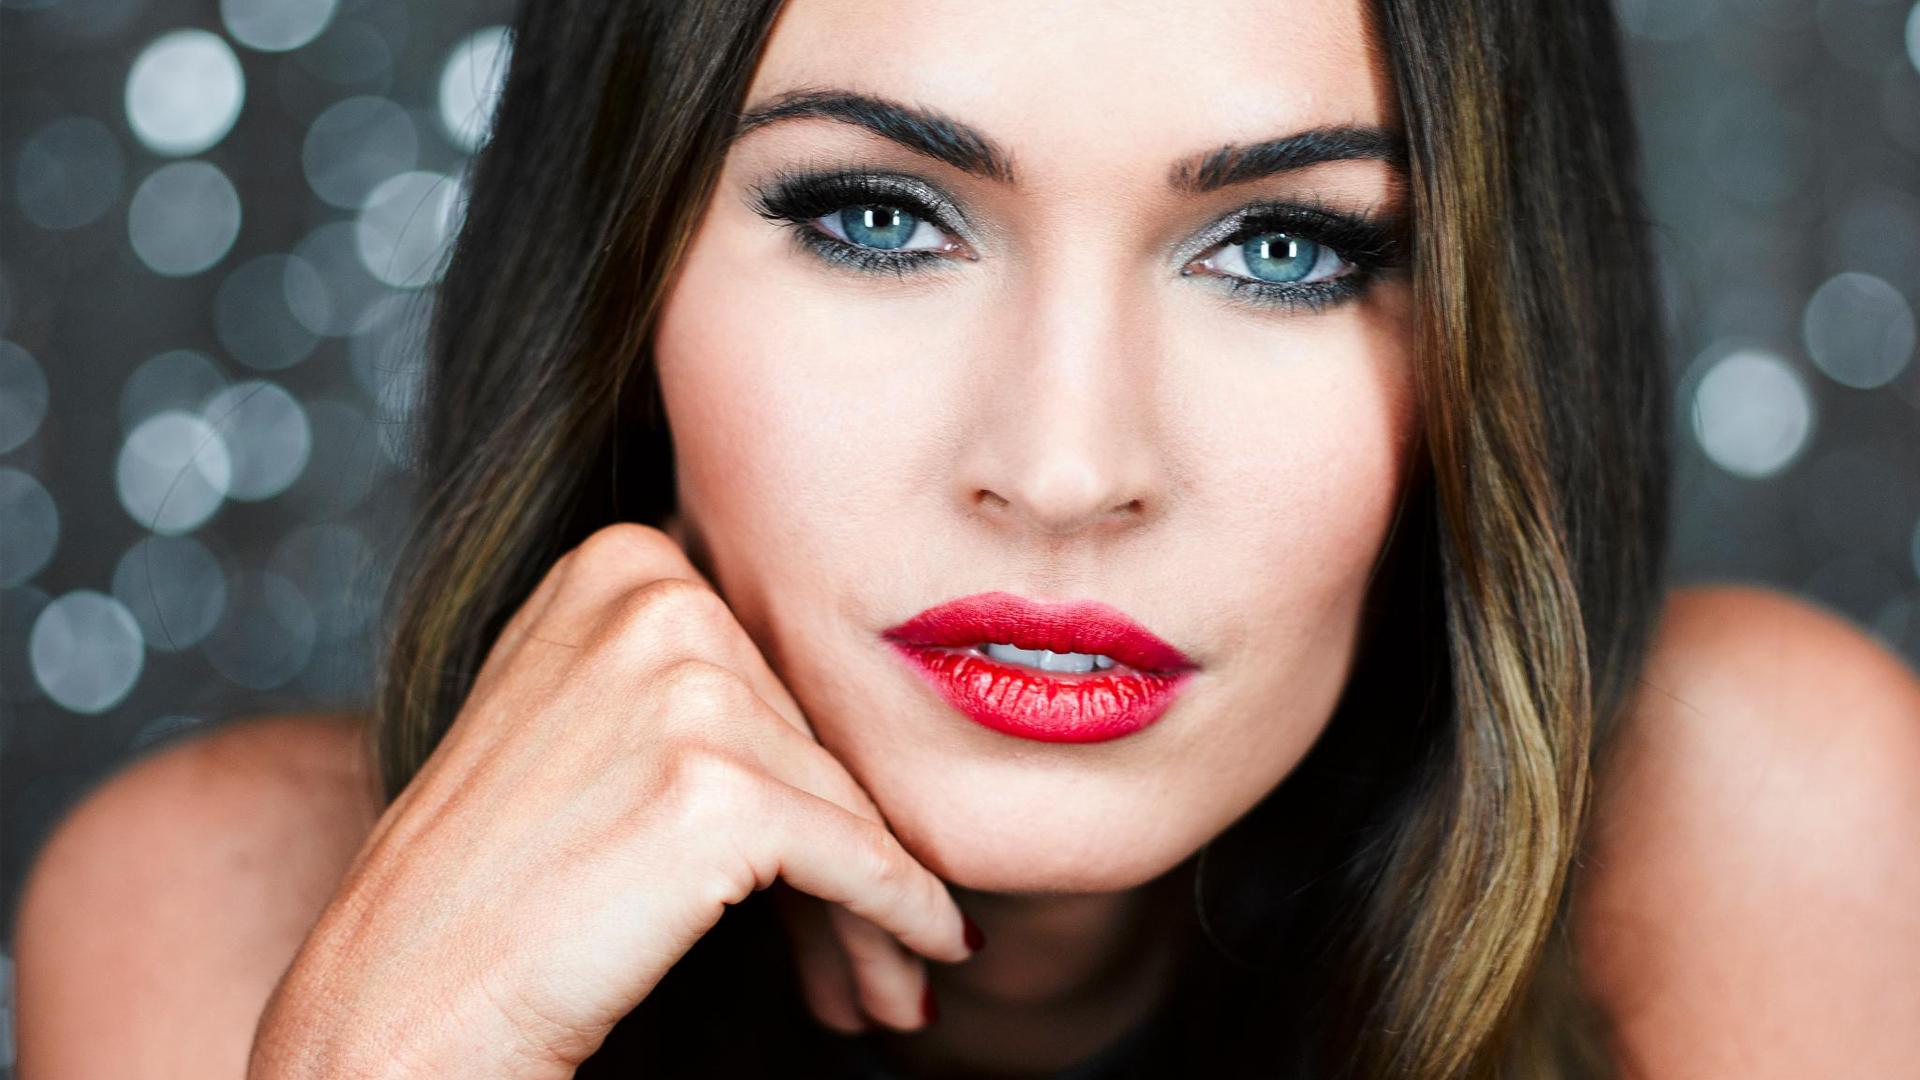 Megan Fox For Desktop